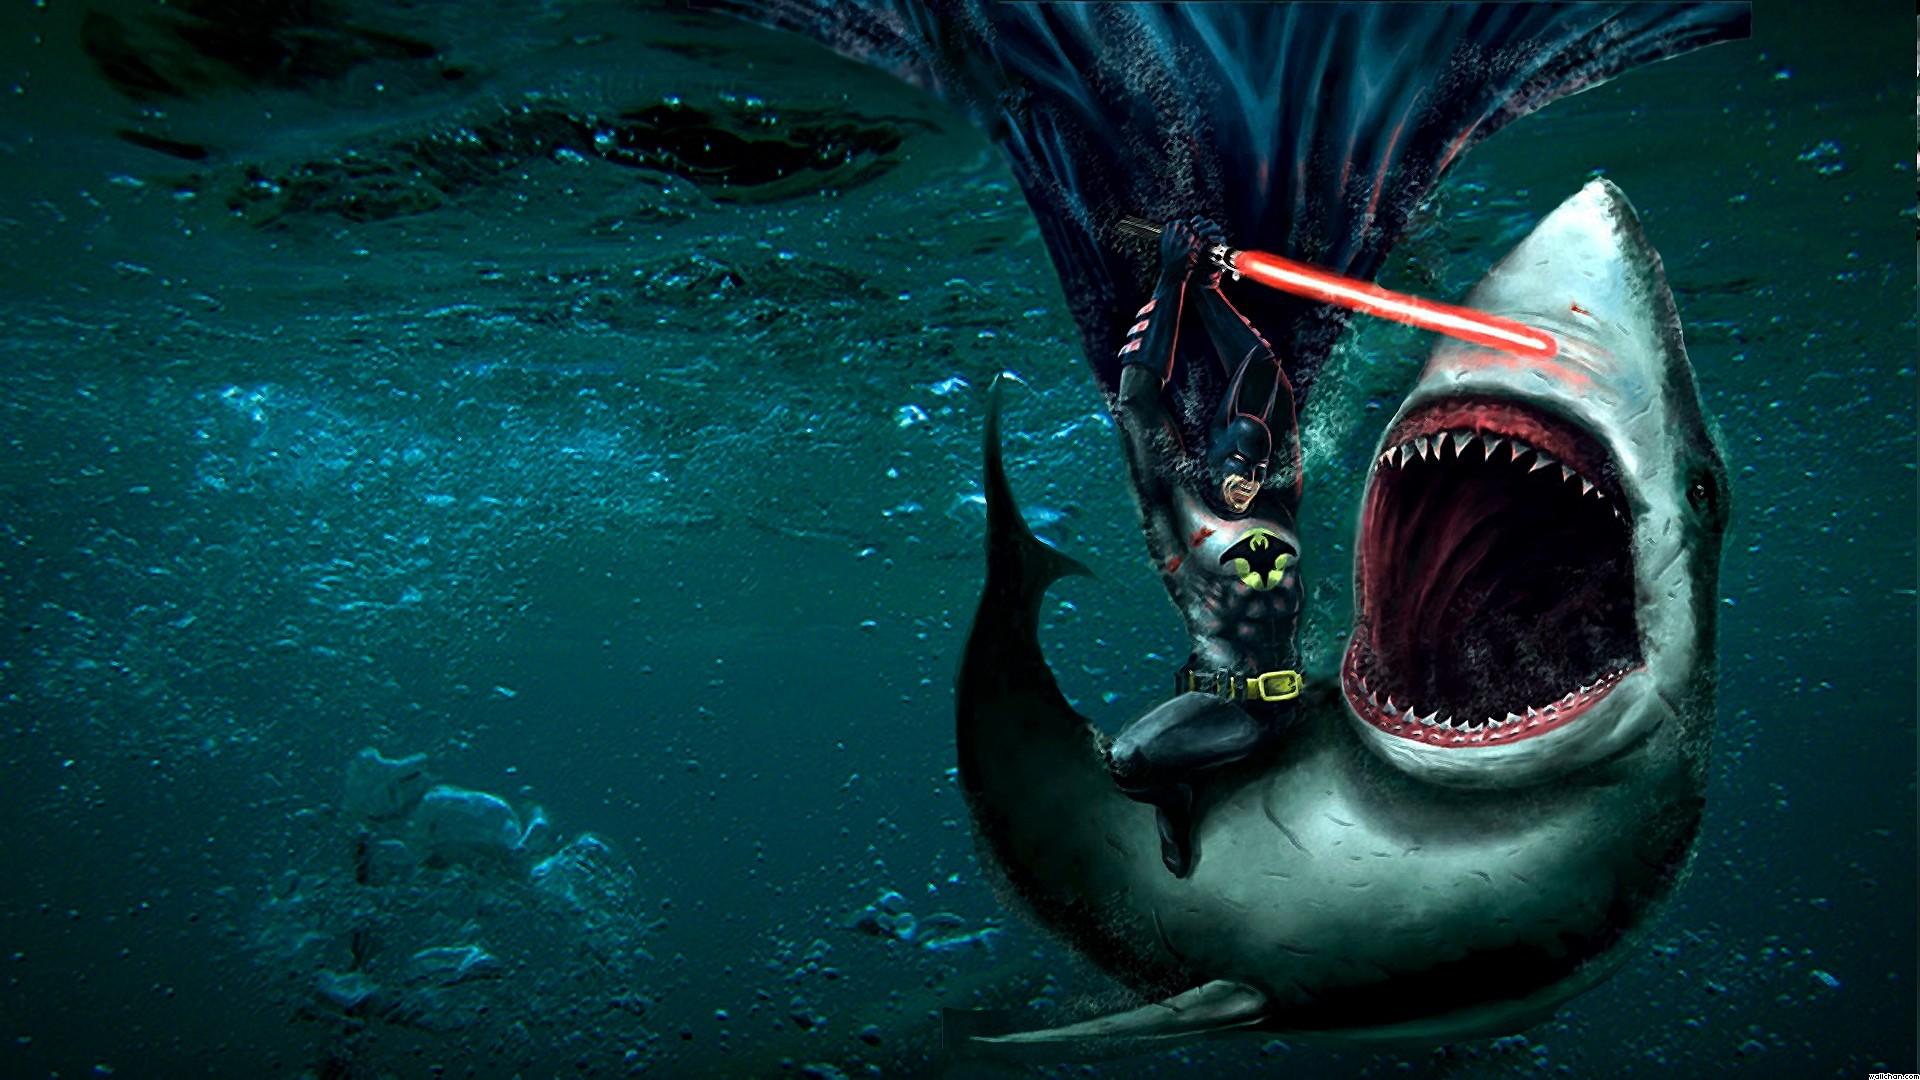 san jose sharks hd wallpaper 65 images